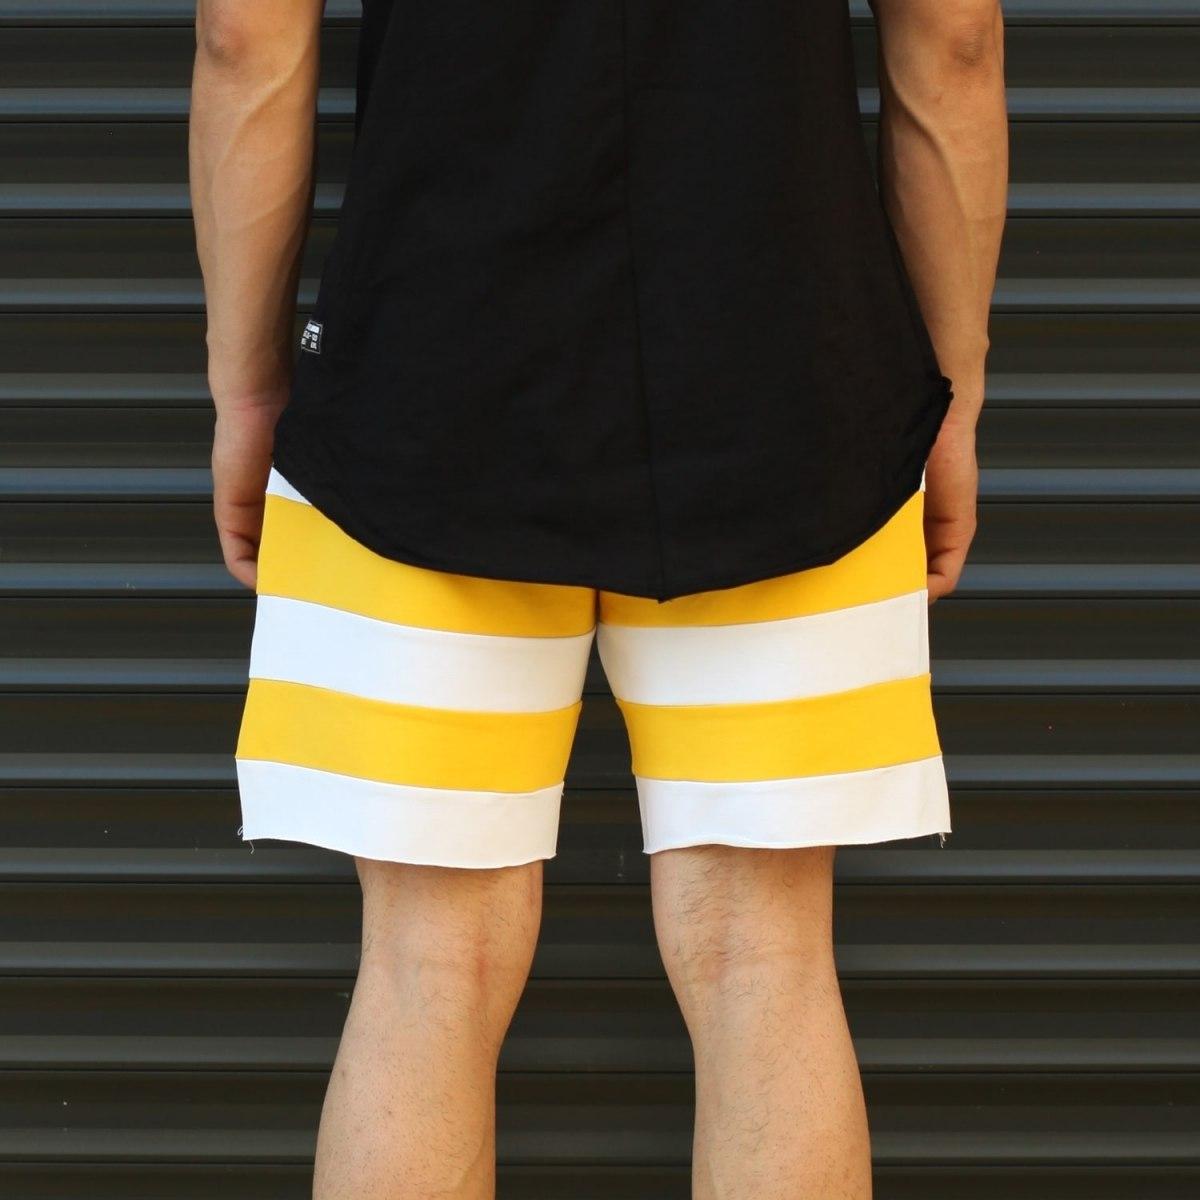 Men's Who Forgets Will Heal Fleece Sport Shorts White Mv Premium Brand - 4